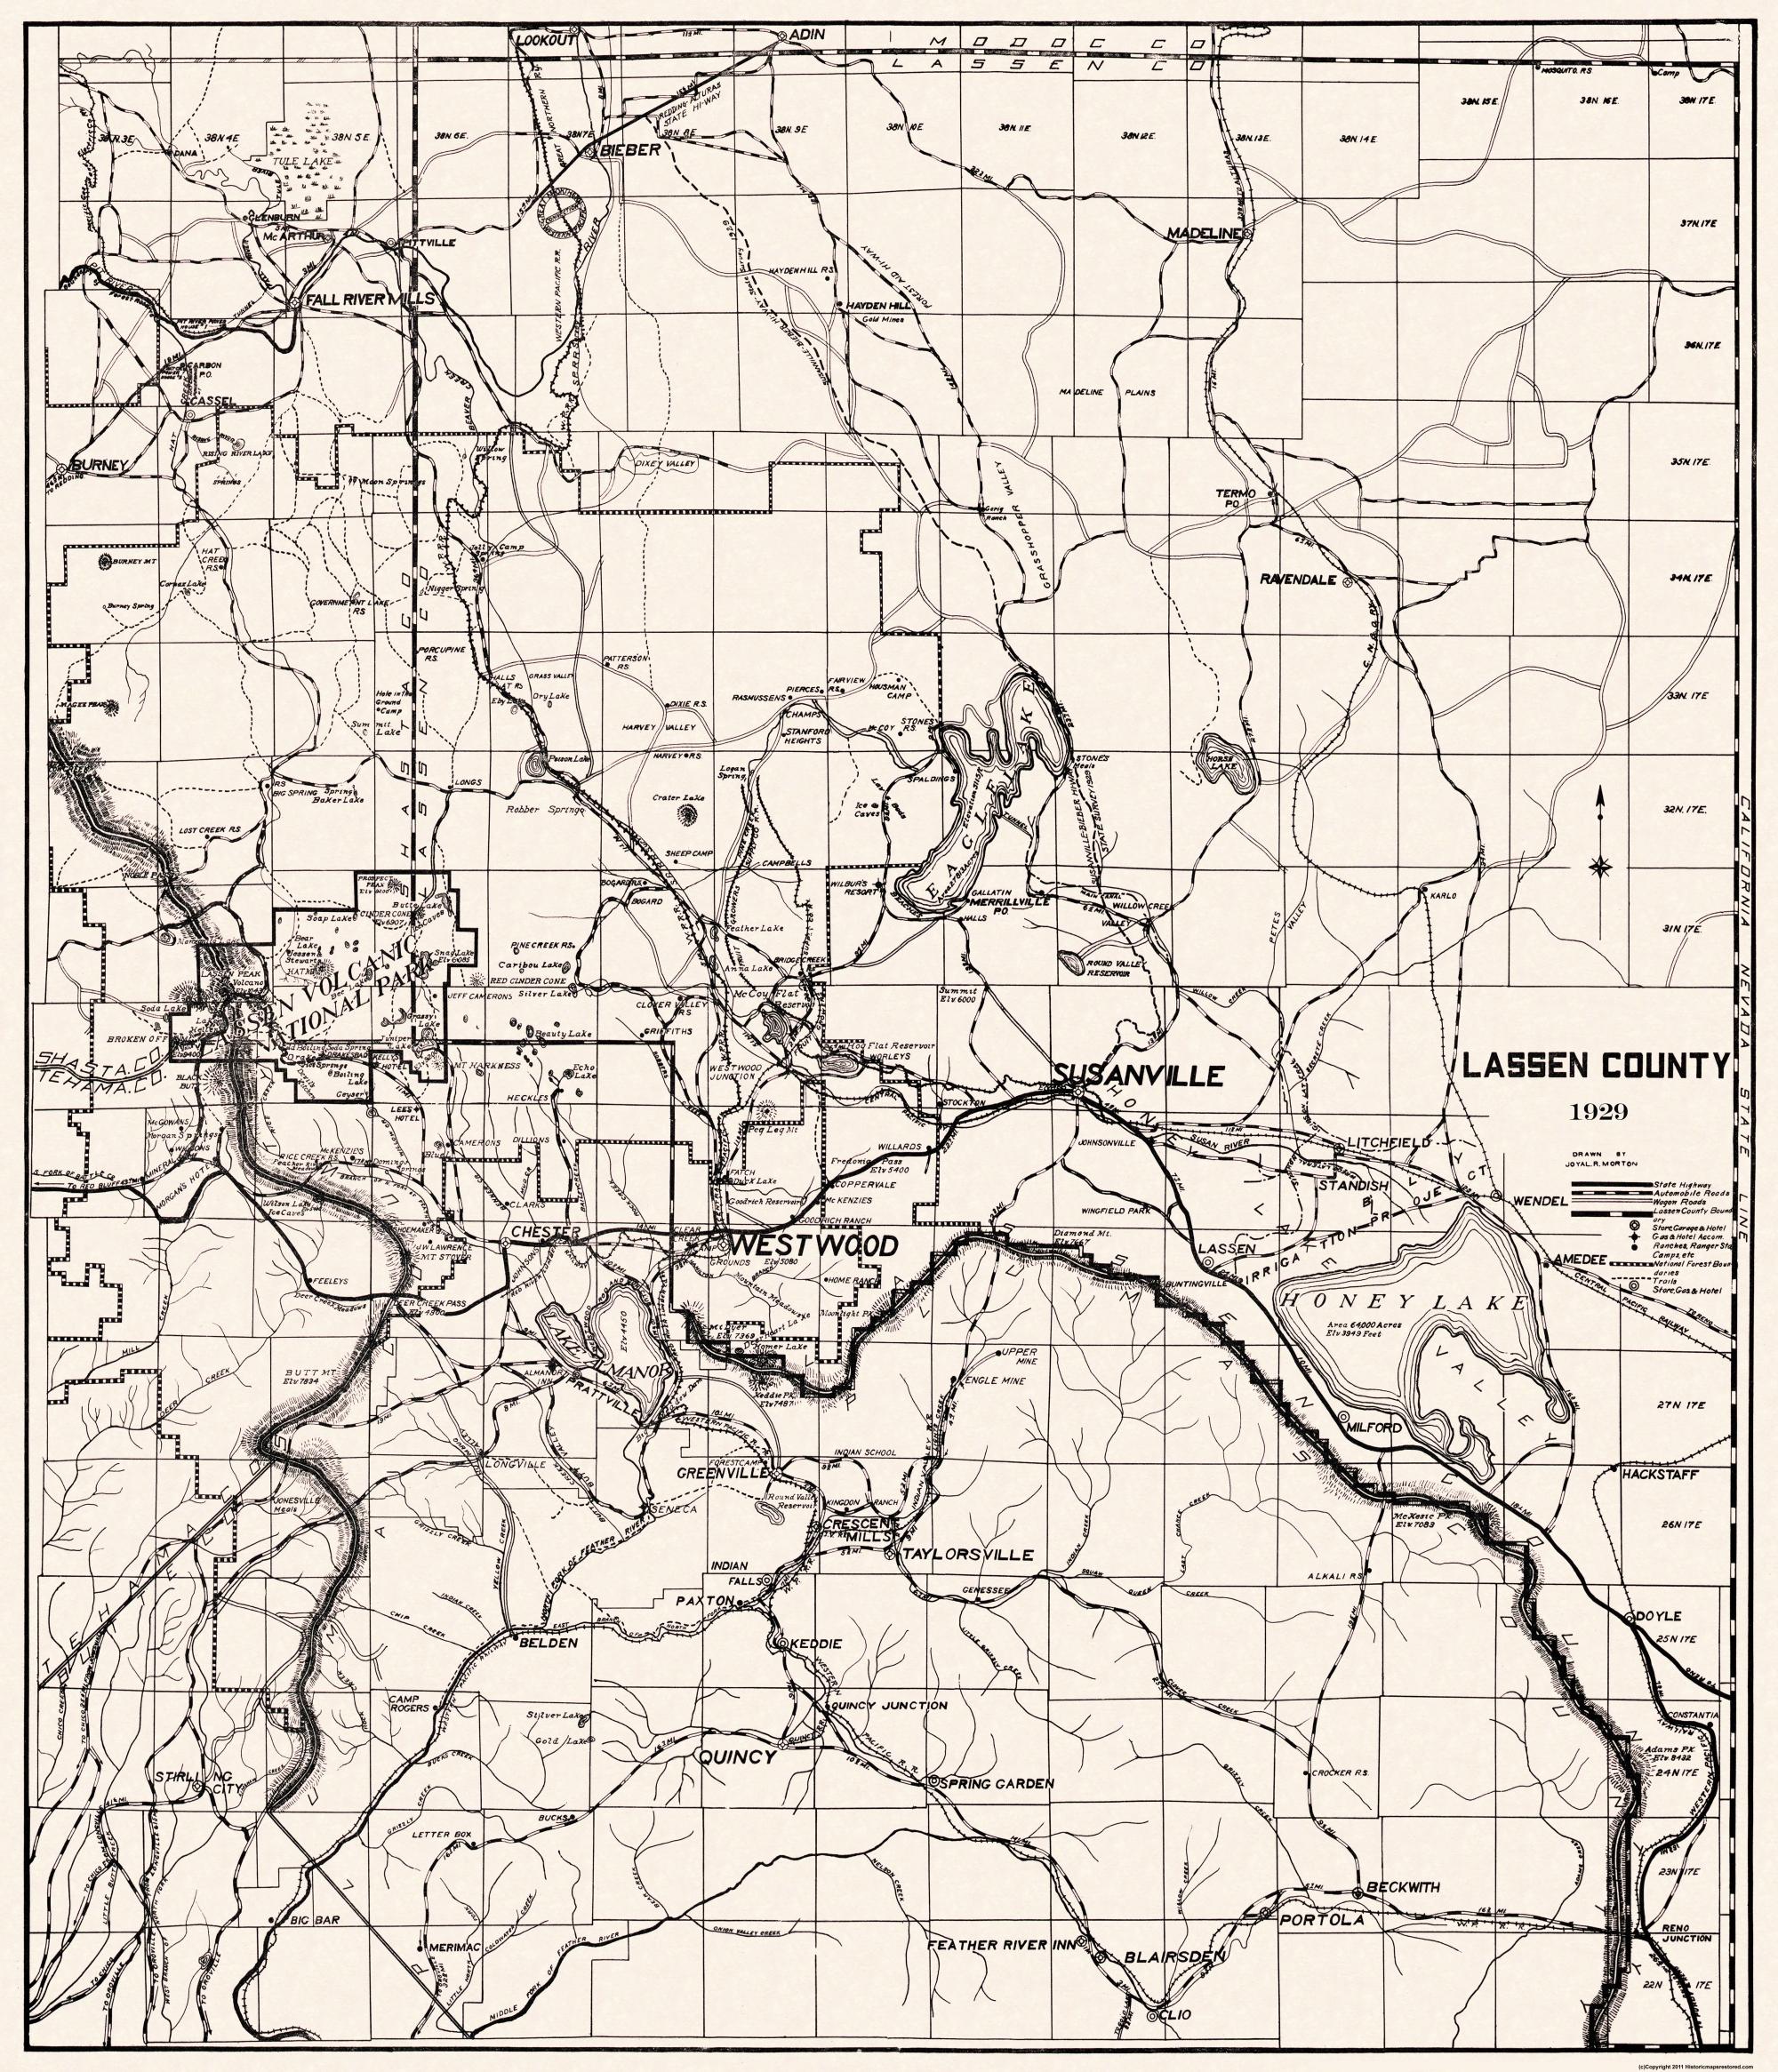 Old County Map Lassen California 1929